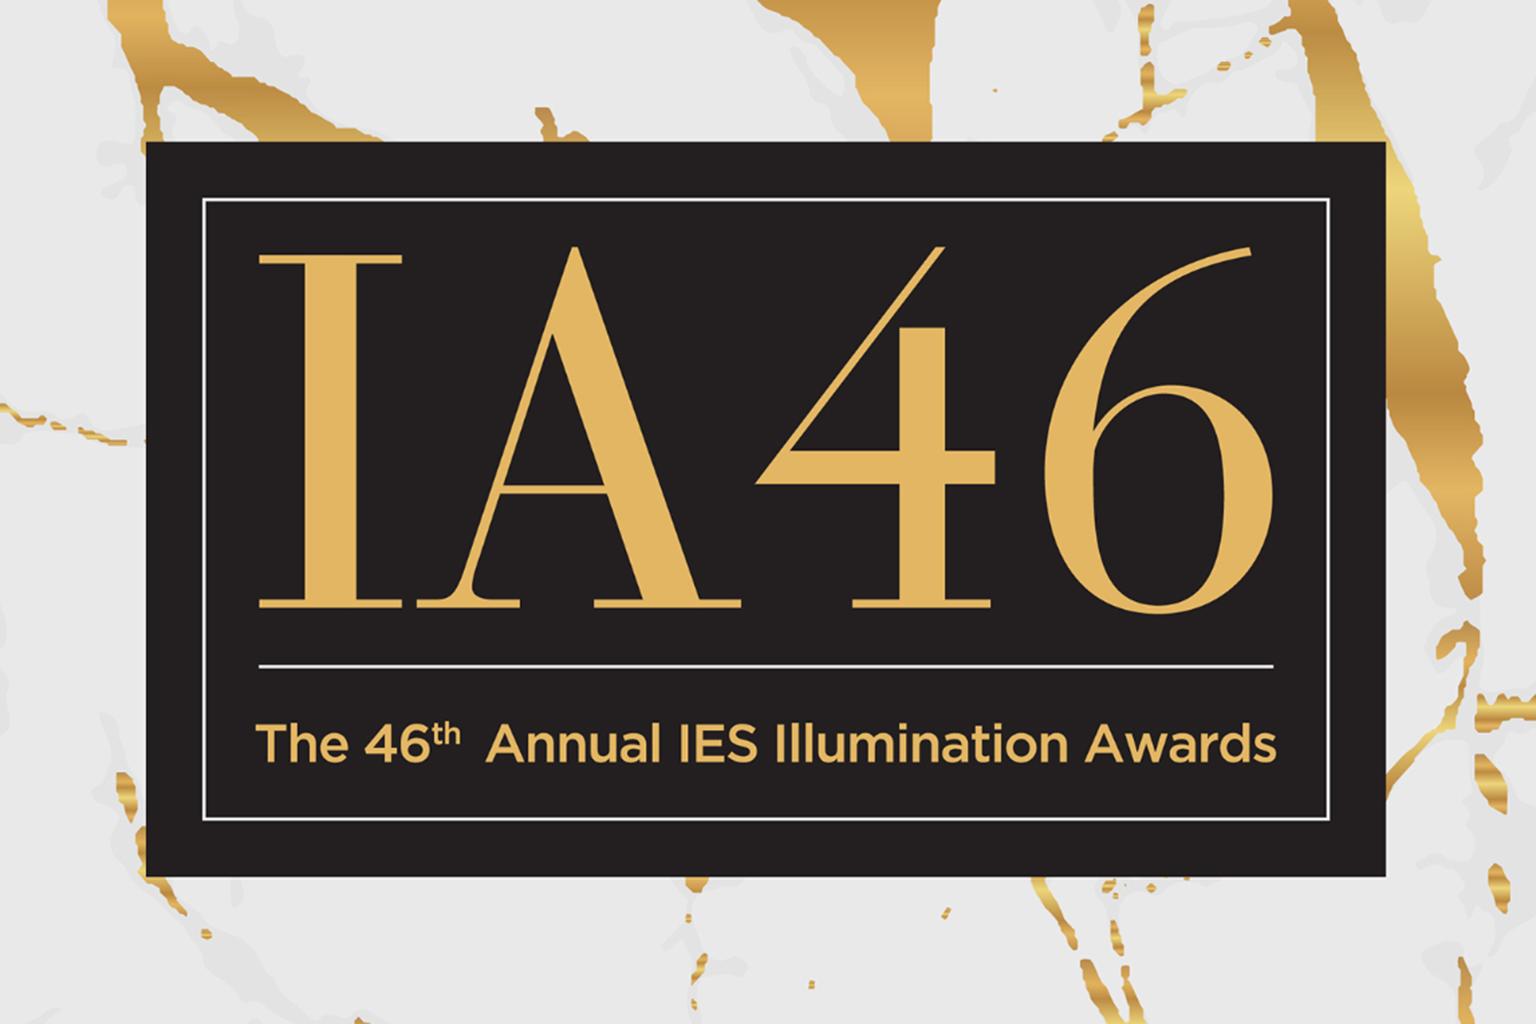 IES 2019 Illumination Awards